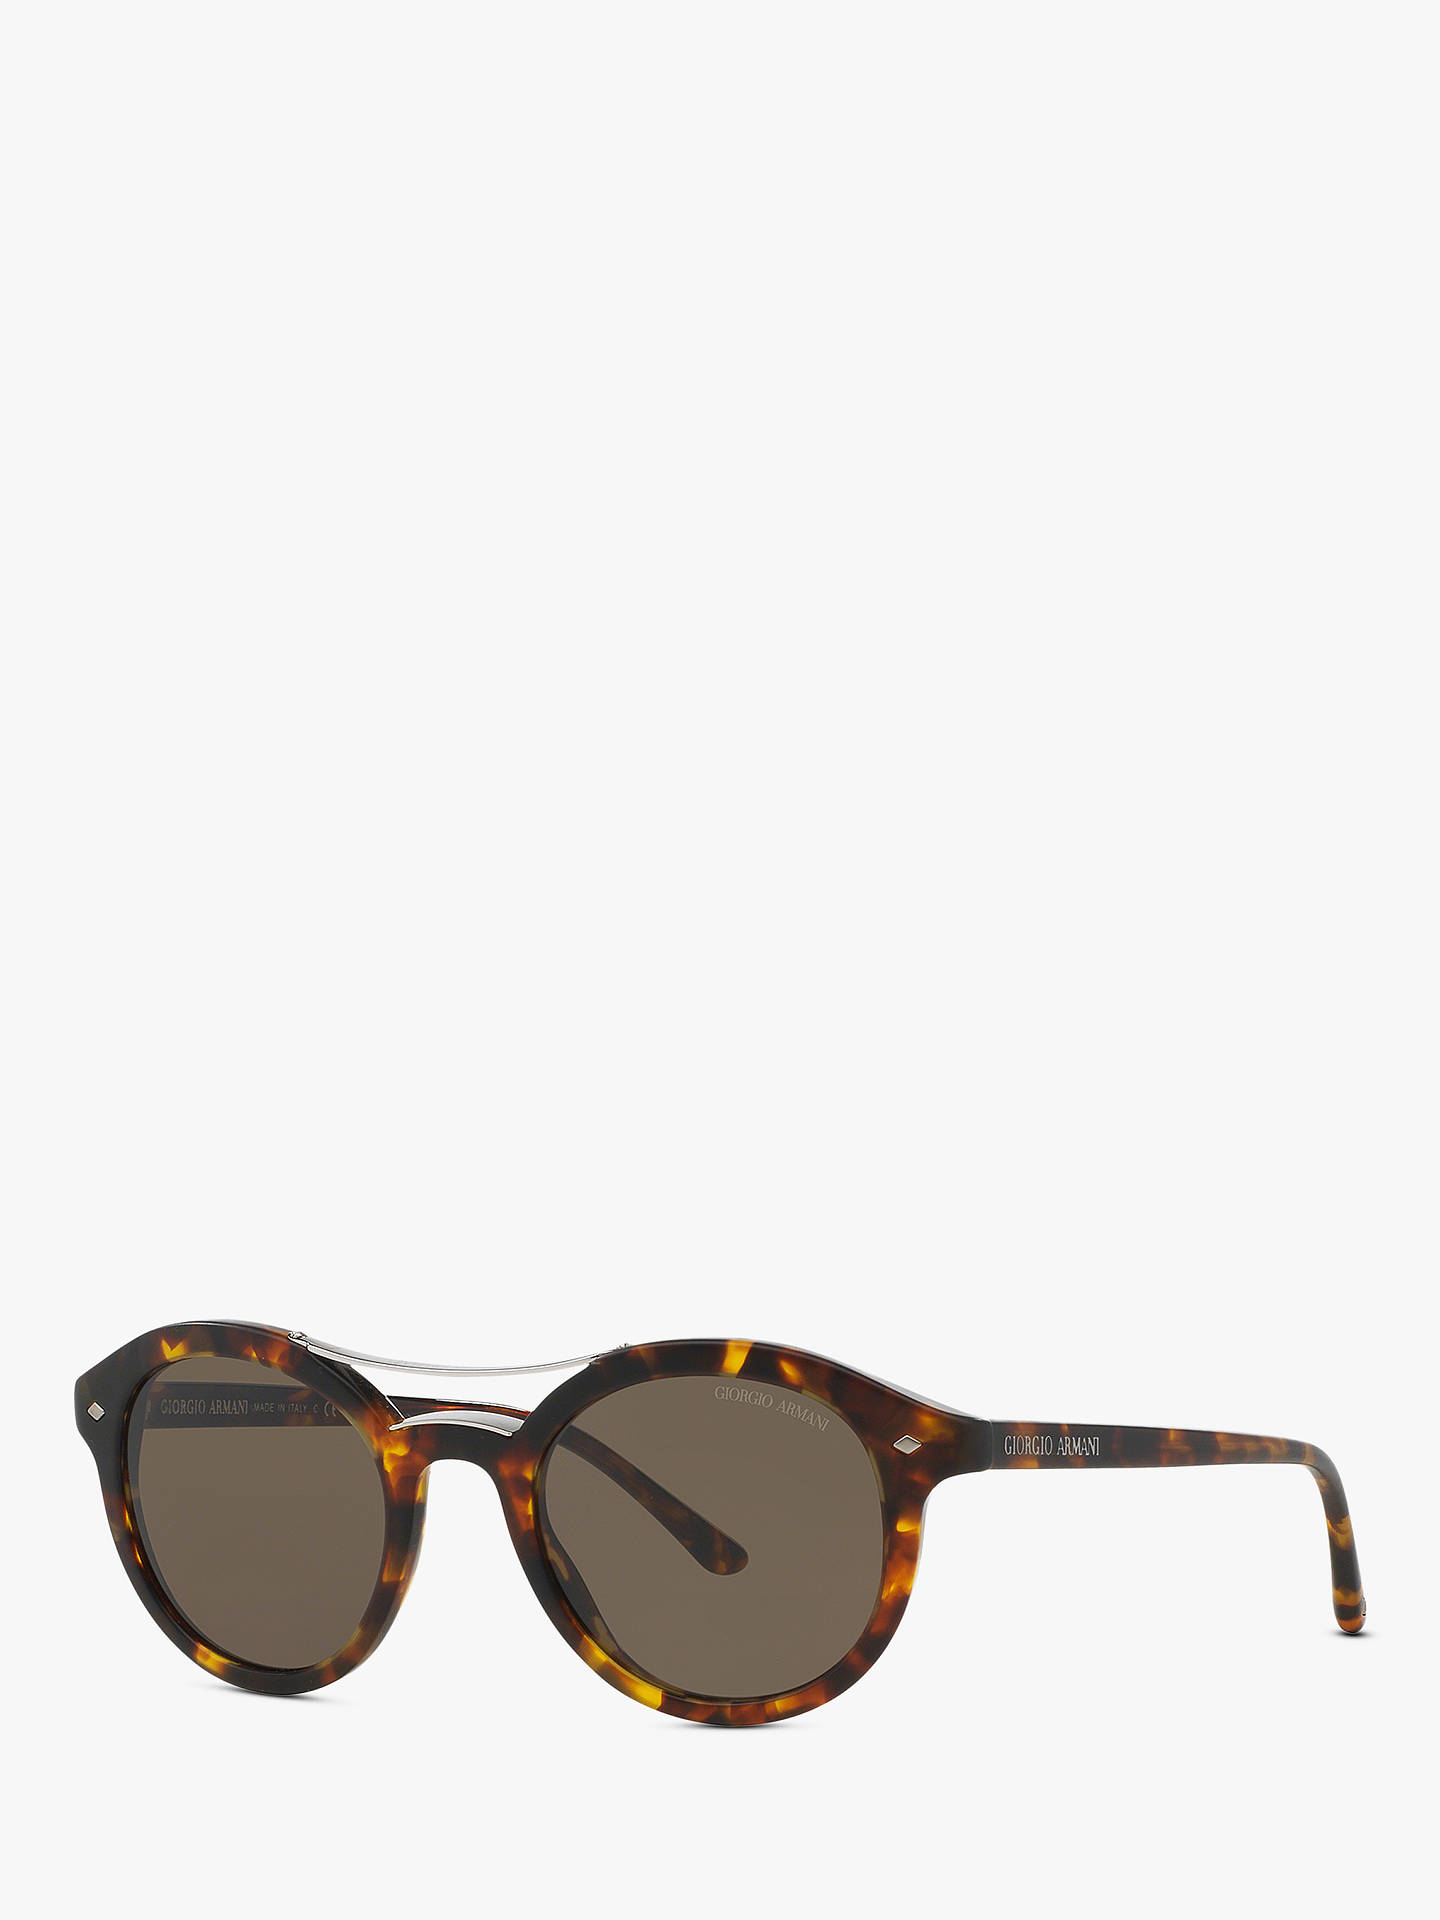 5827becea128 Buy Giorgio Armani AR8007 Men s Round Sunglasses